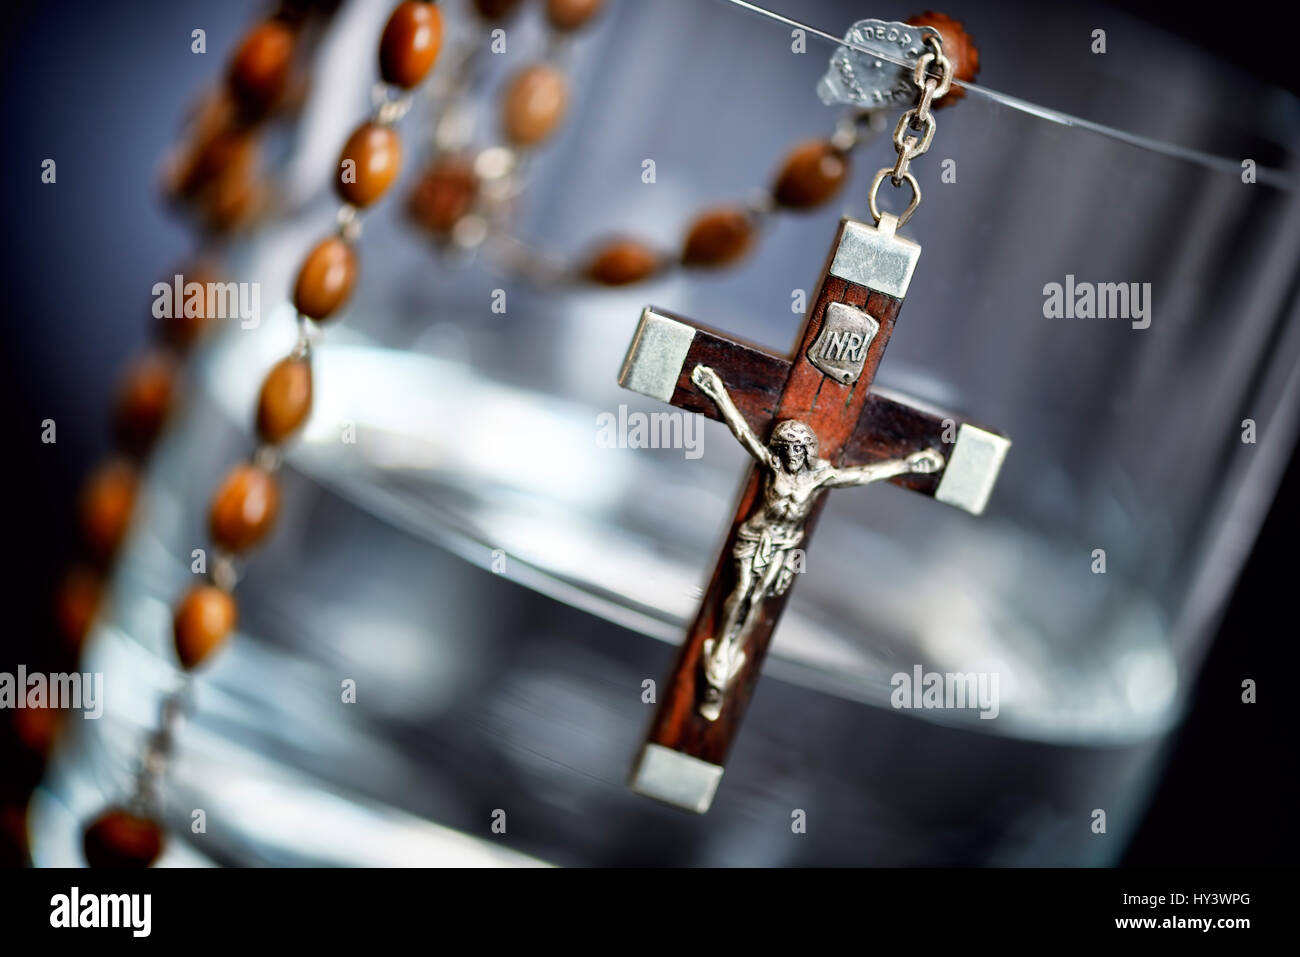 Water glass with cross, symbolic photo Sterbehilfe, Wasserglas mit Kreuz, Symbolfoto Sterbehilfe Stock Photo